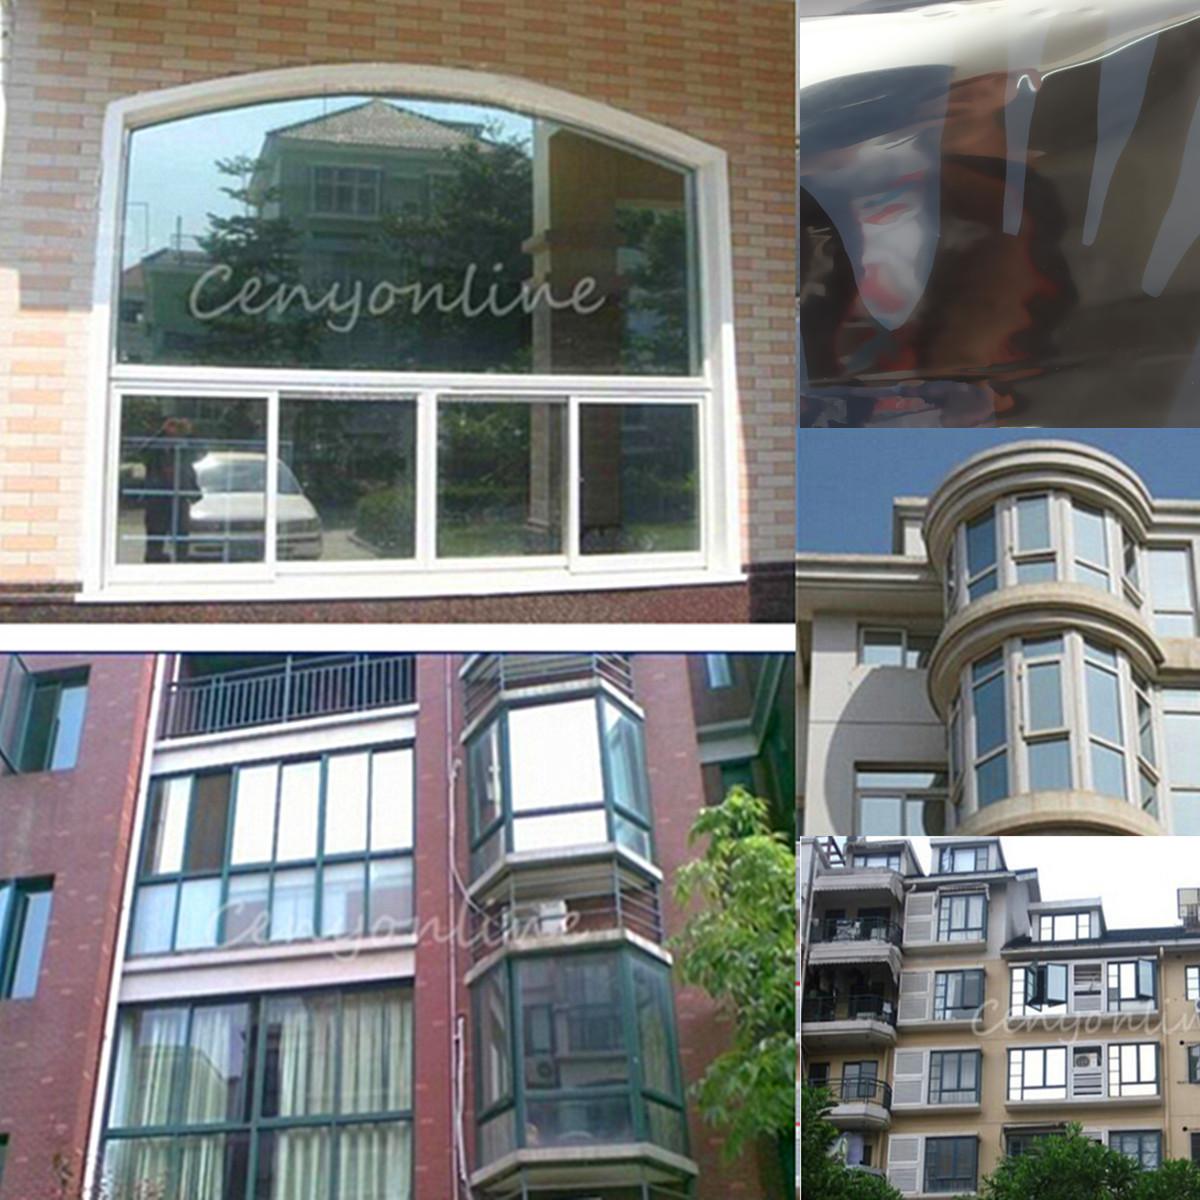 3 meter mirror silver solar reflective window film one way for 2 way privacy window film